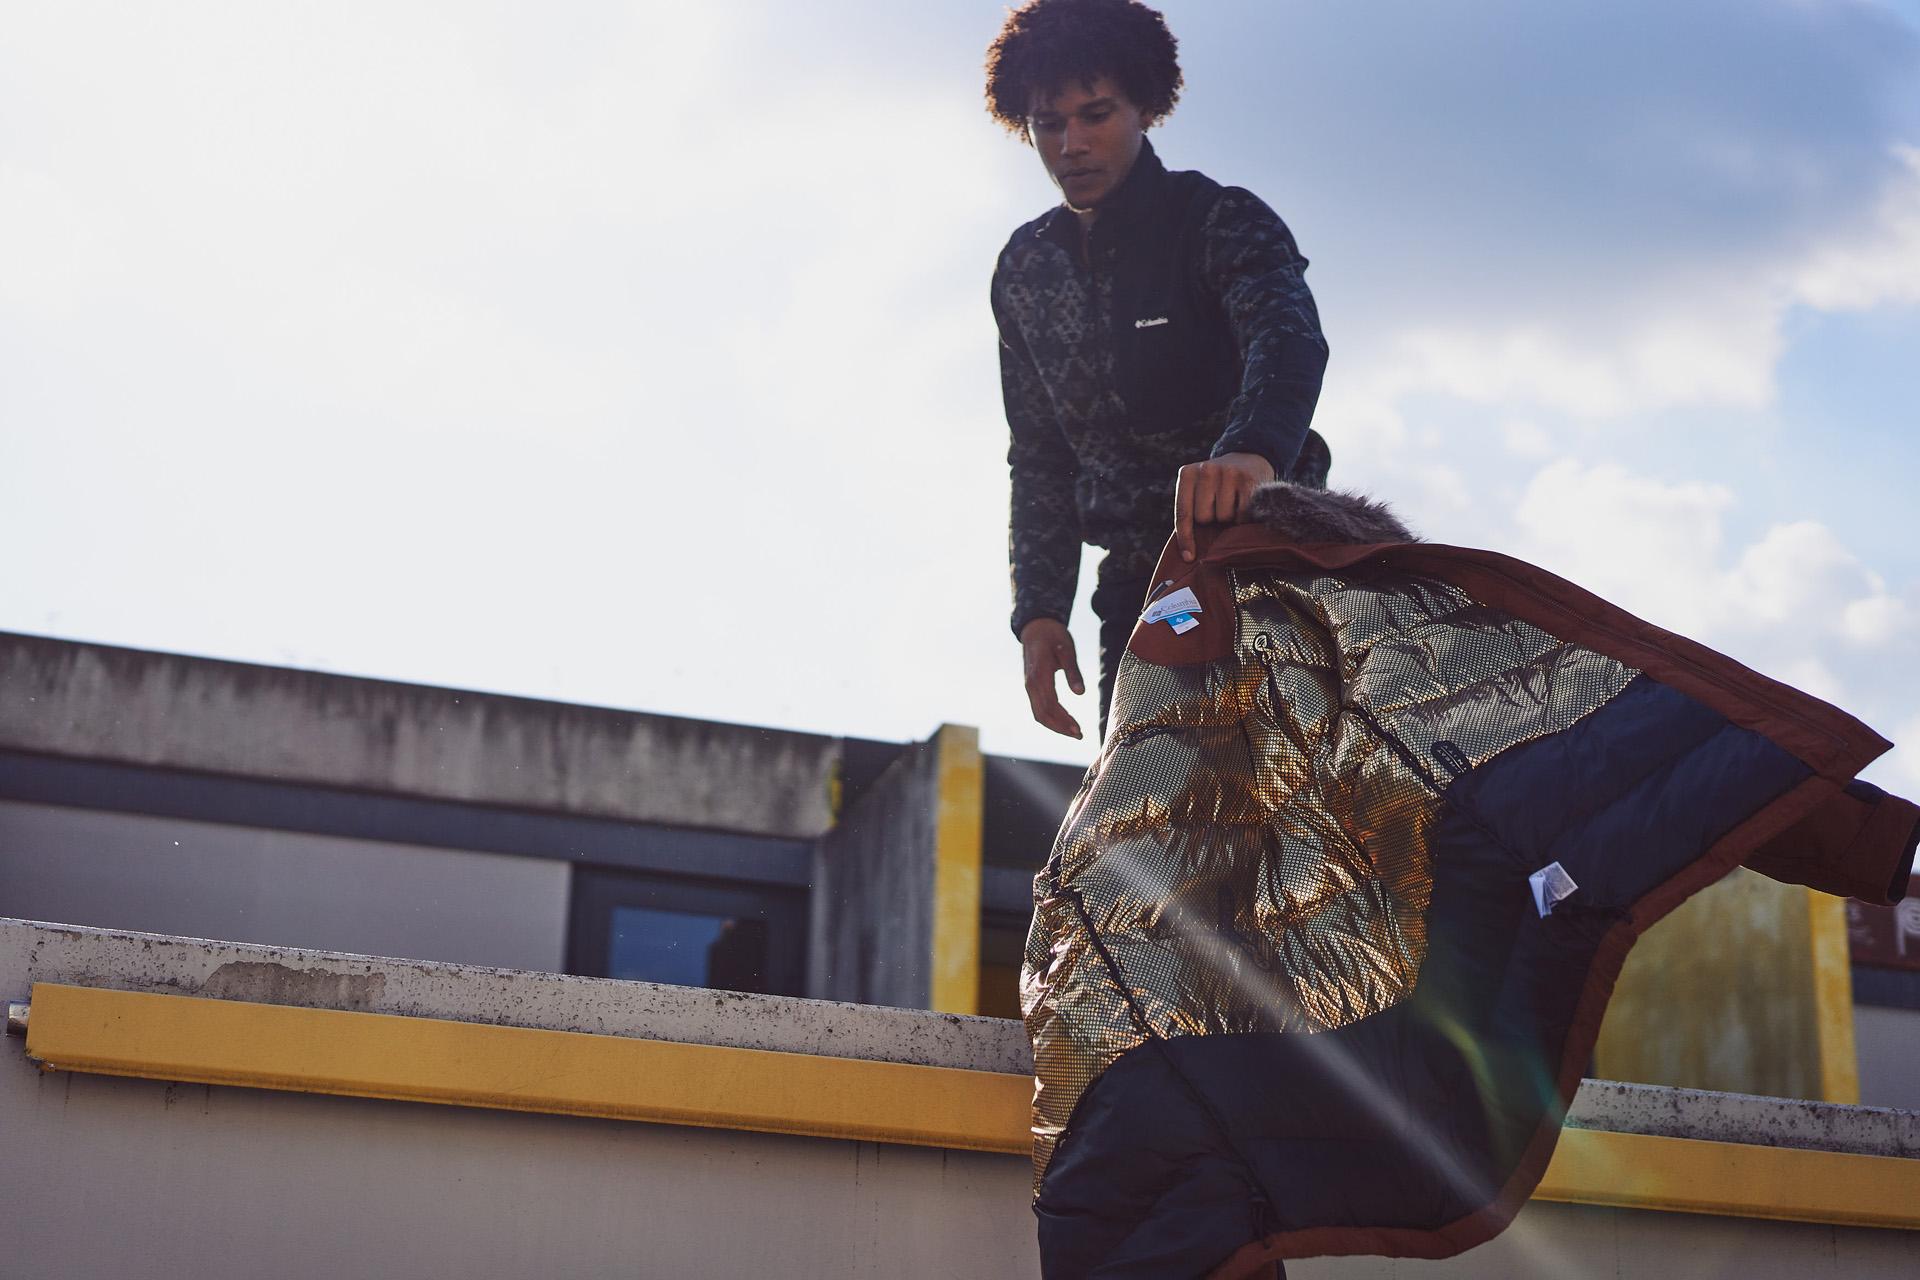 jacke-mann-lifestyle-columbia-sportswear